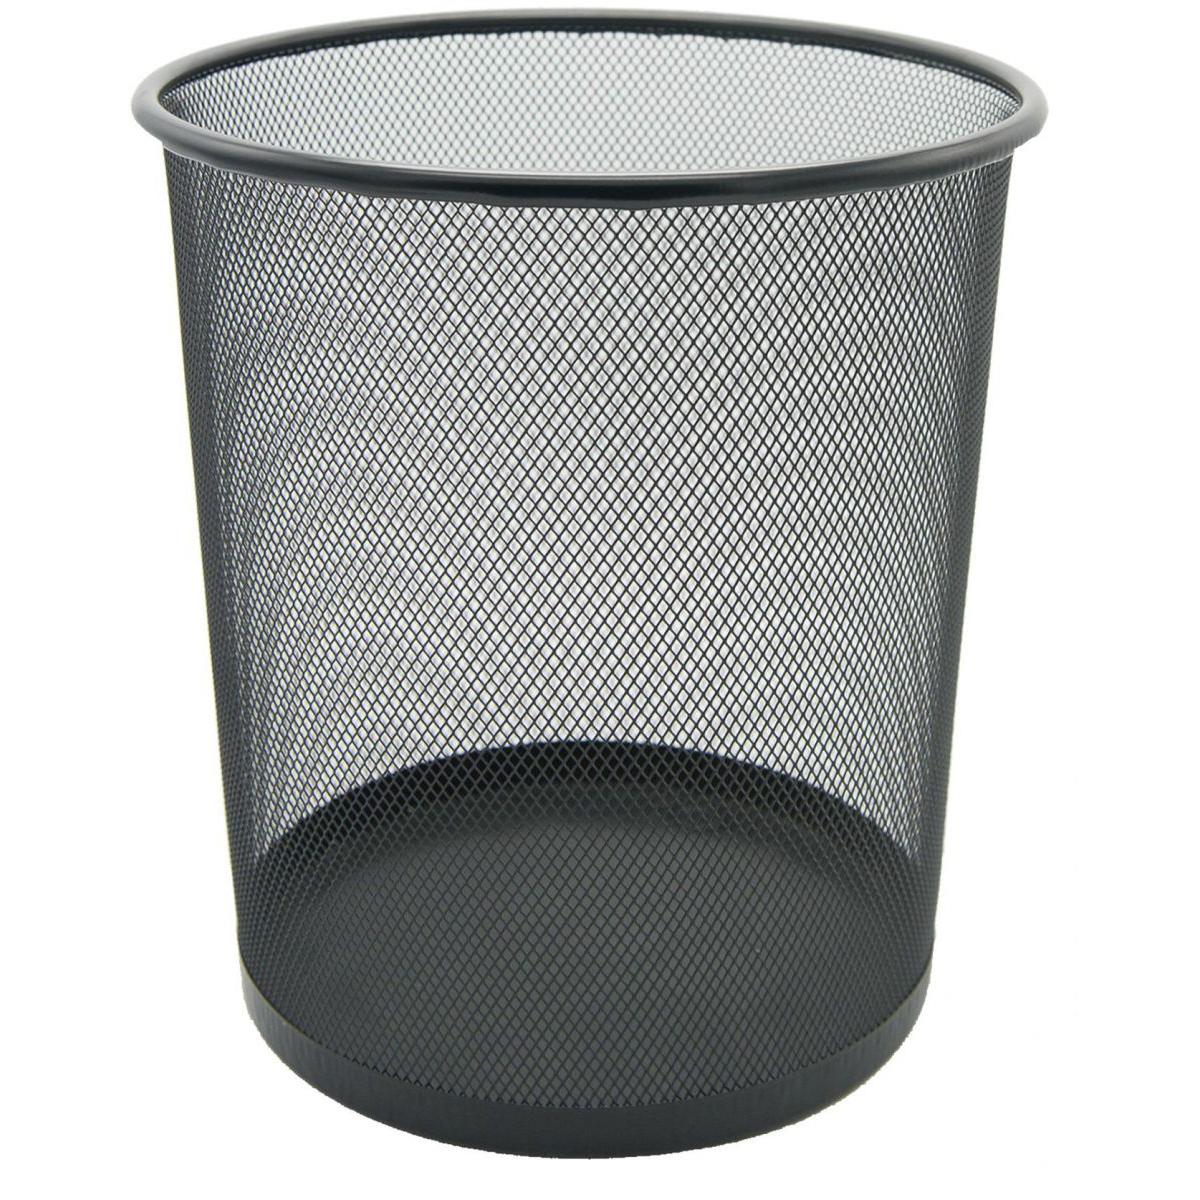 FIS FSWA101BK Round 23cm x 26cm Wire Mesh Basket - Black (pc)